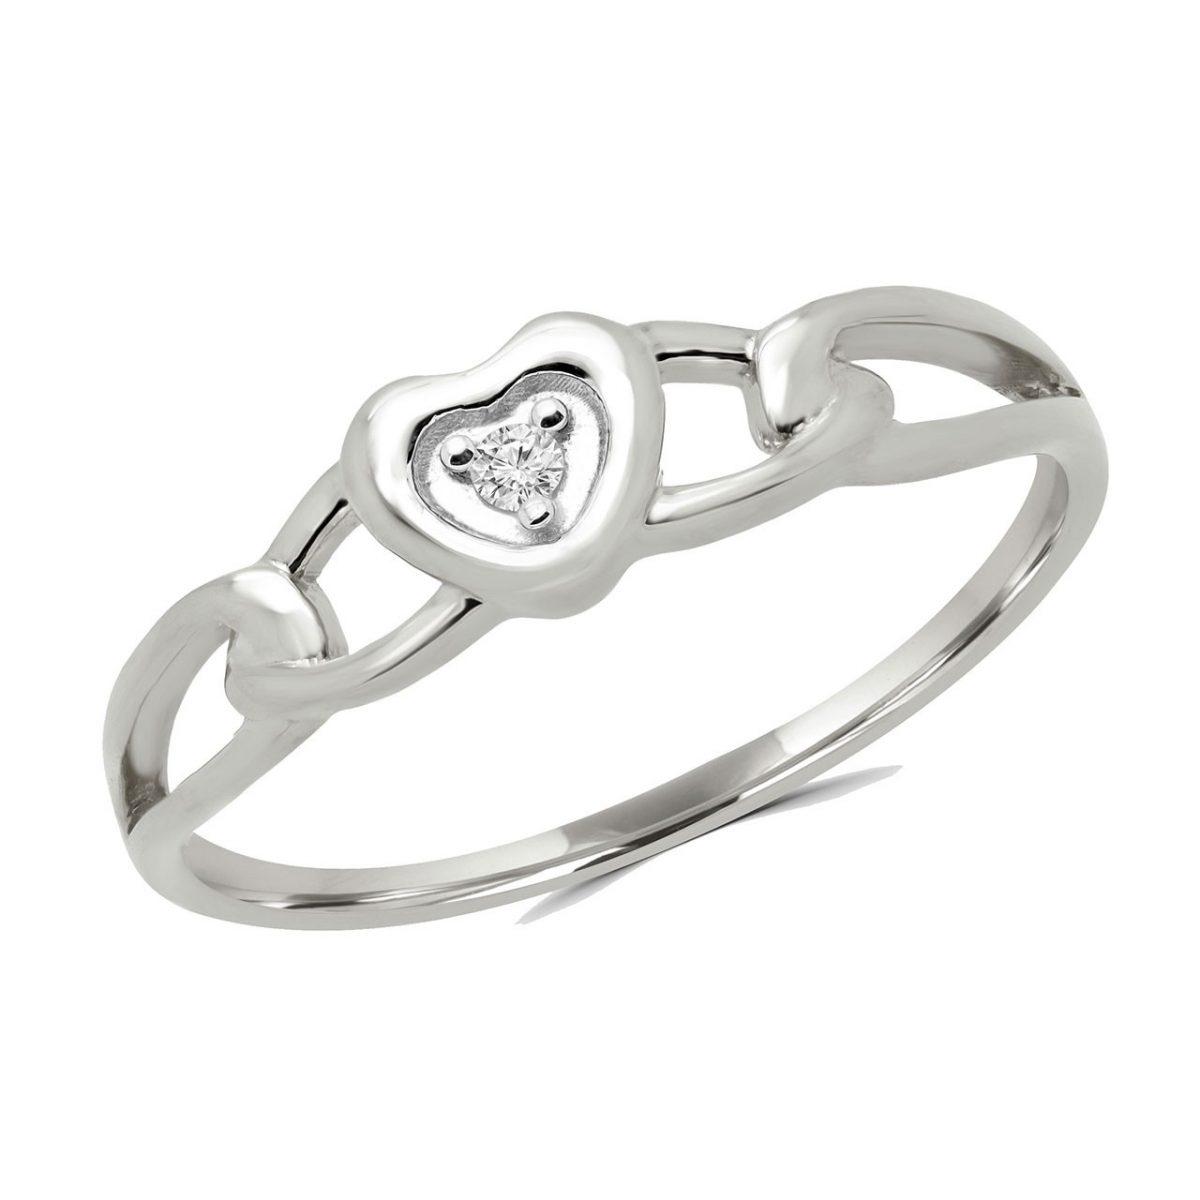 2e11f08514884b 0.02 carat round diamond heart promise ring in 10k white gold ...